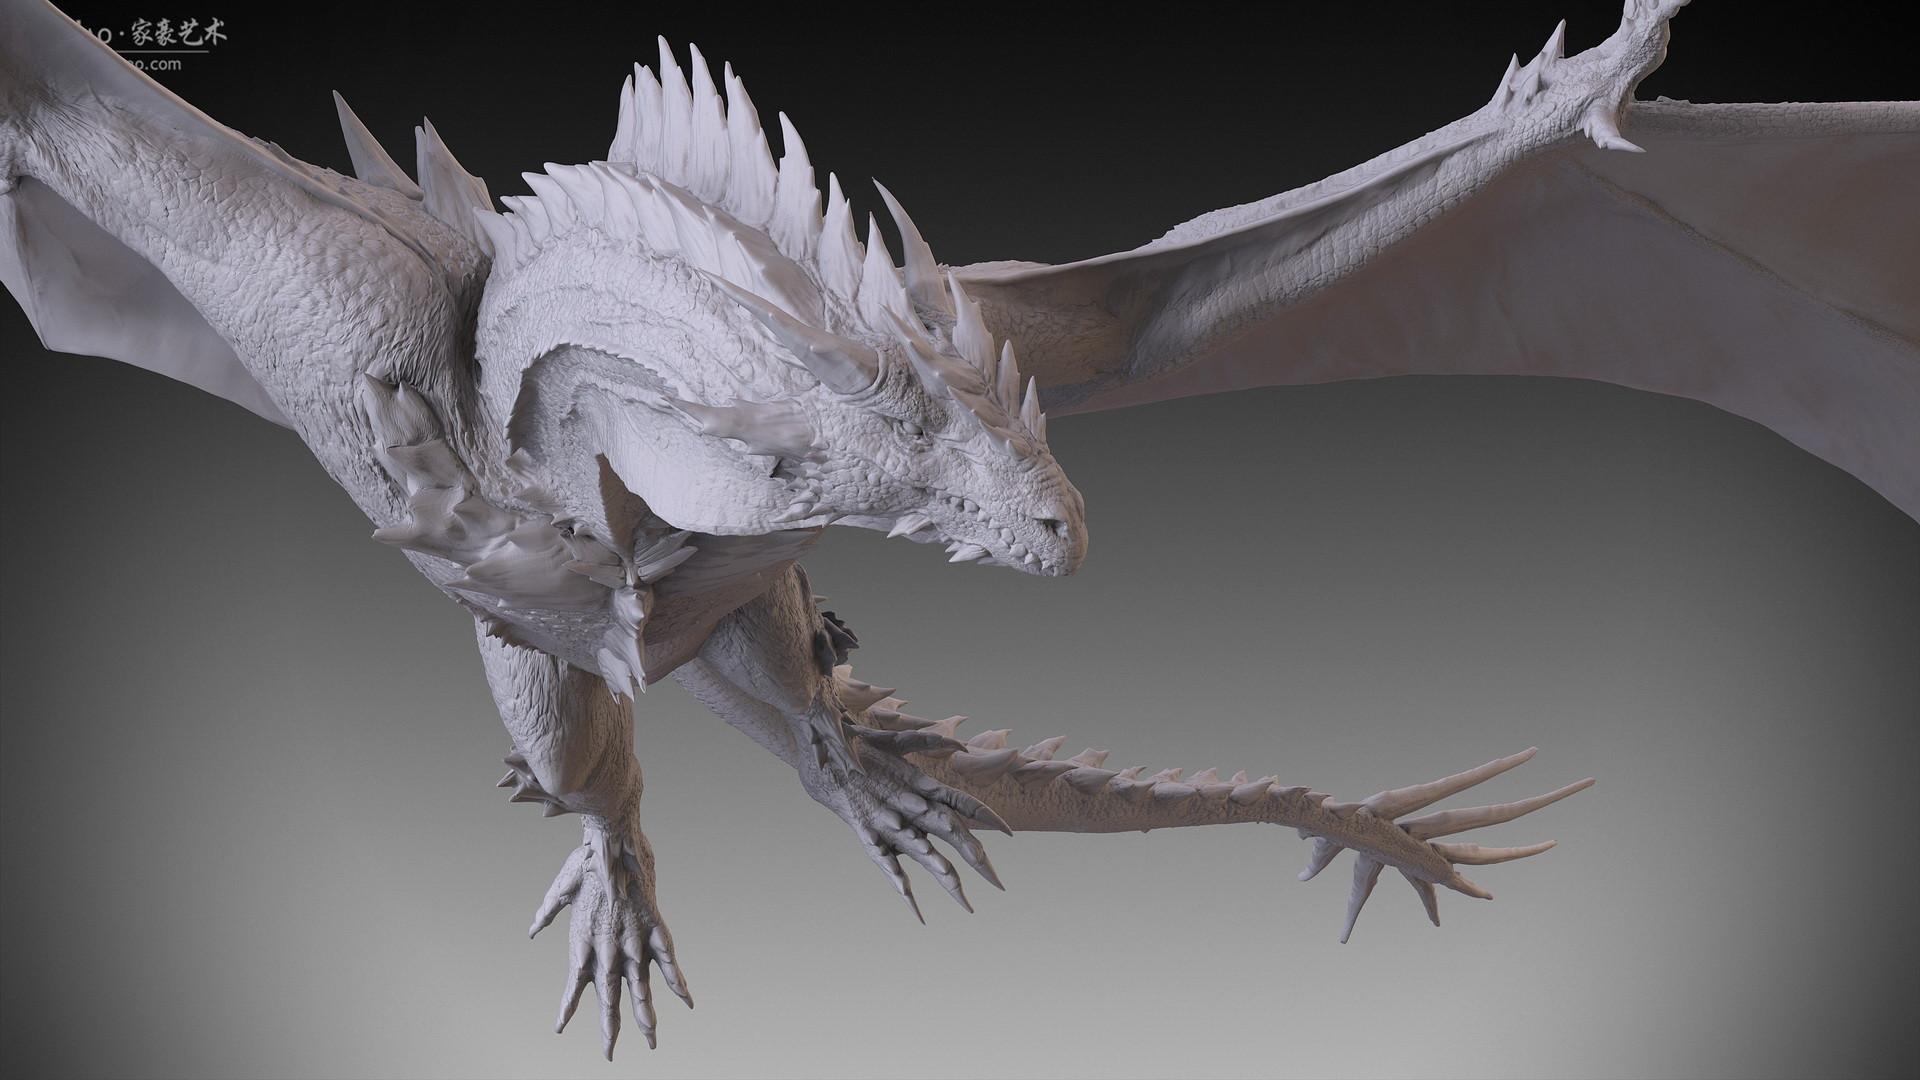 Jia hao 2017 spikydragon flying digitalsculpting 06